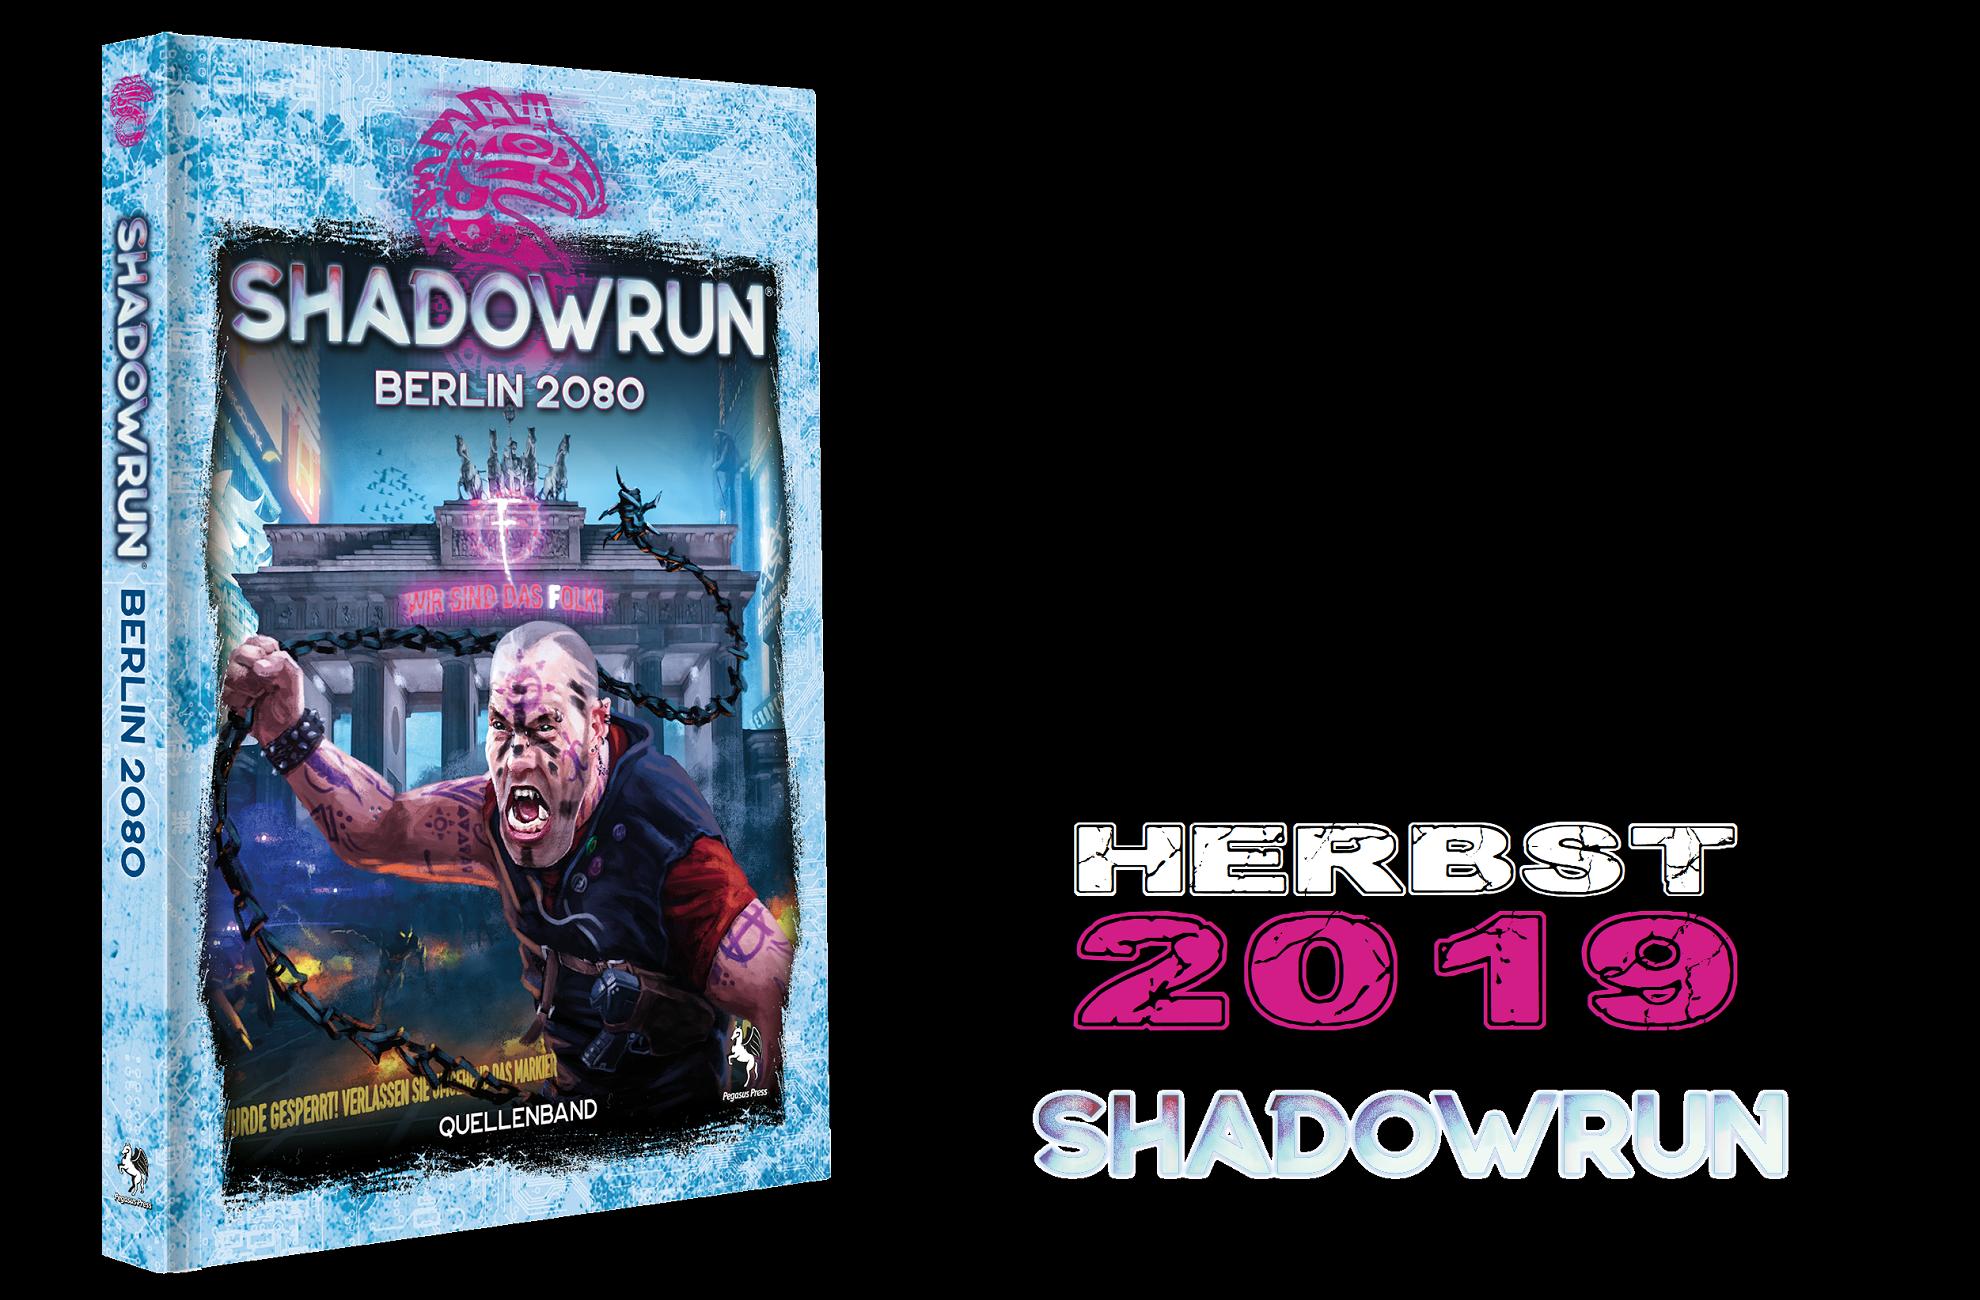 berlin-2080-sr6-herbst-2019-promo01.png